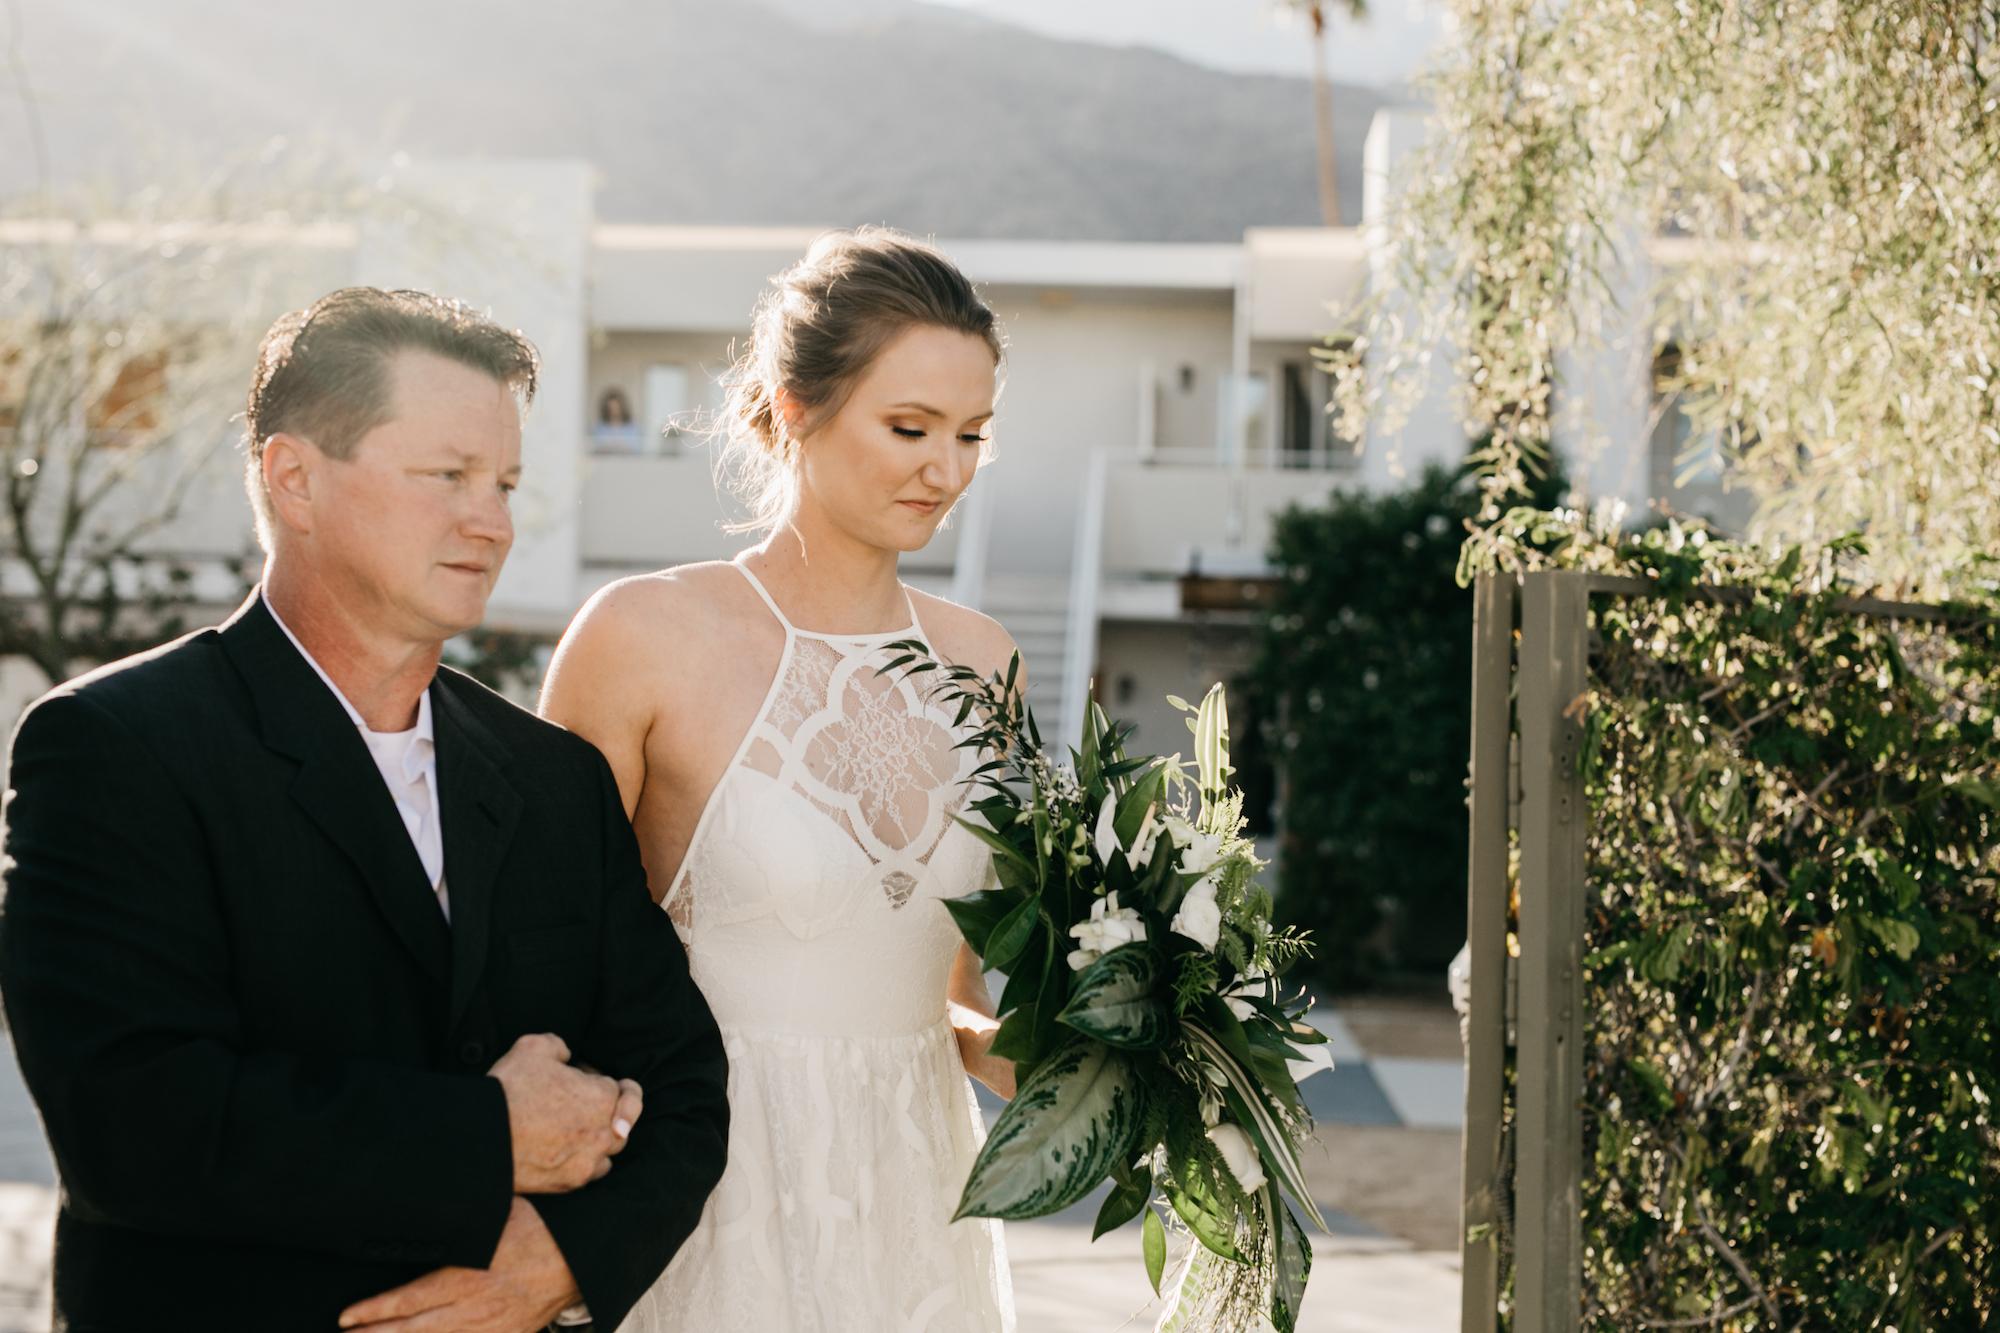 ace-hotel-palm-springs-wedding-photographer494.jpg